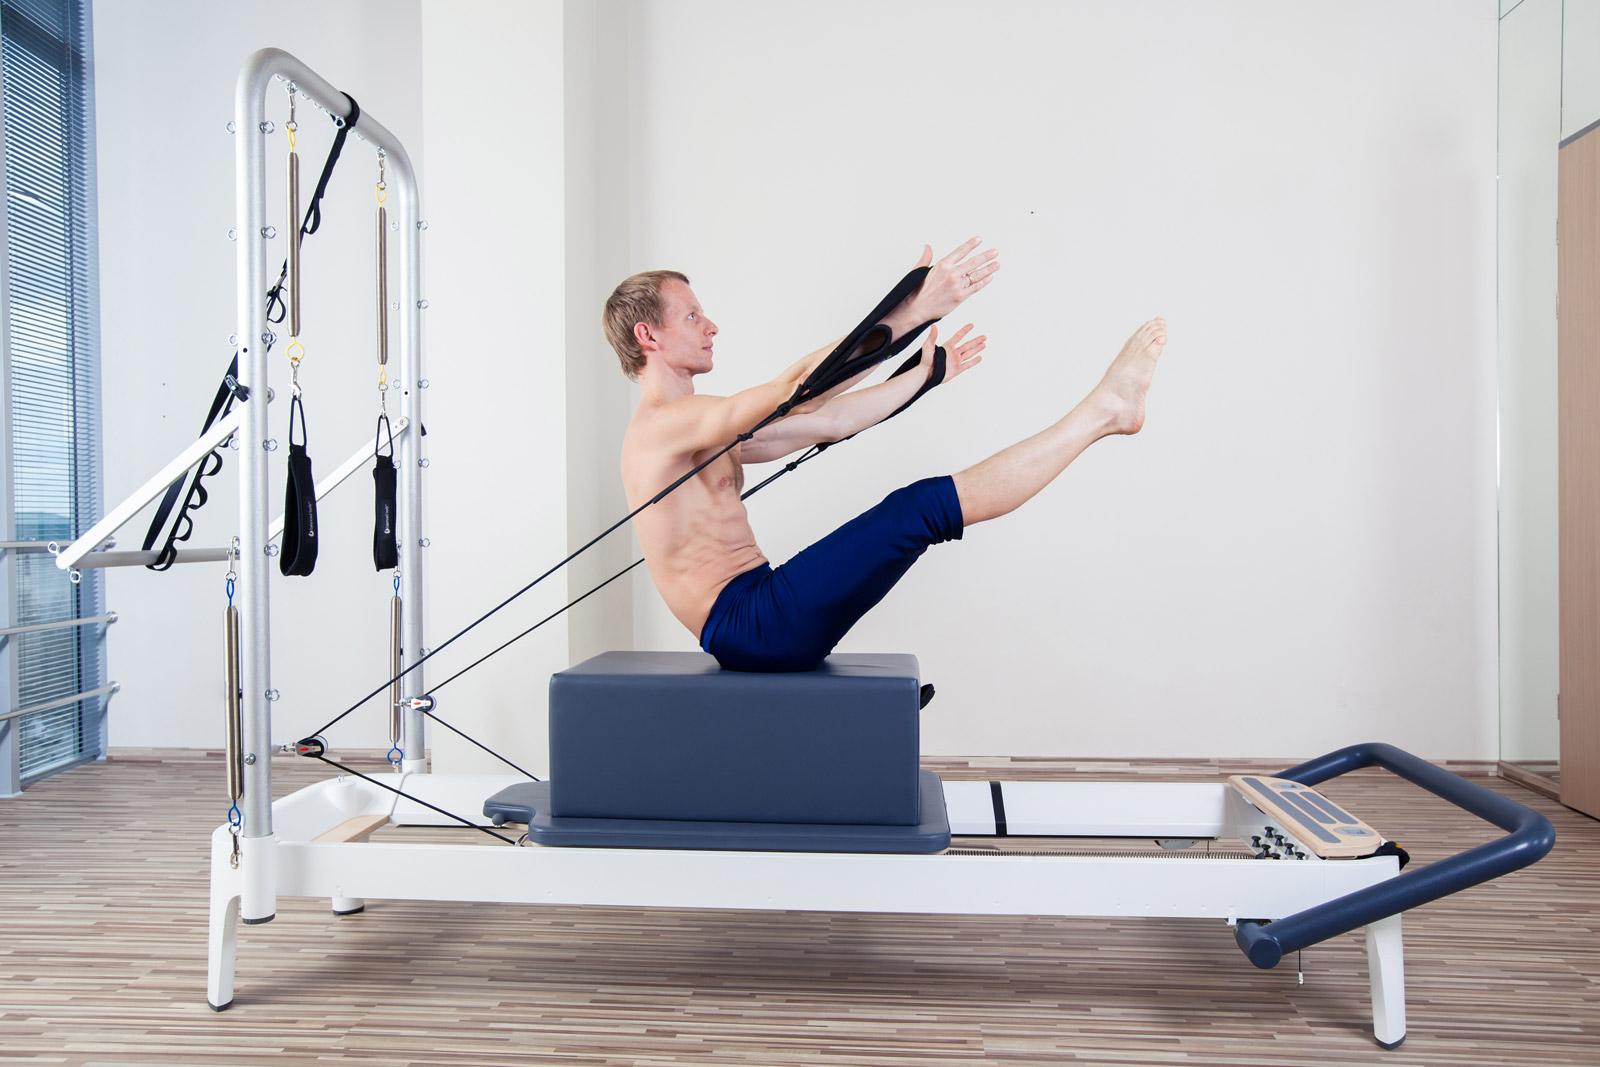 puissance corporelle - Home Inspiration Pilates Marbella